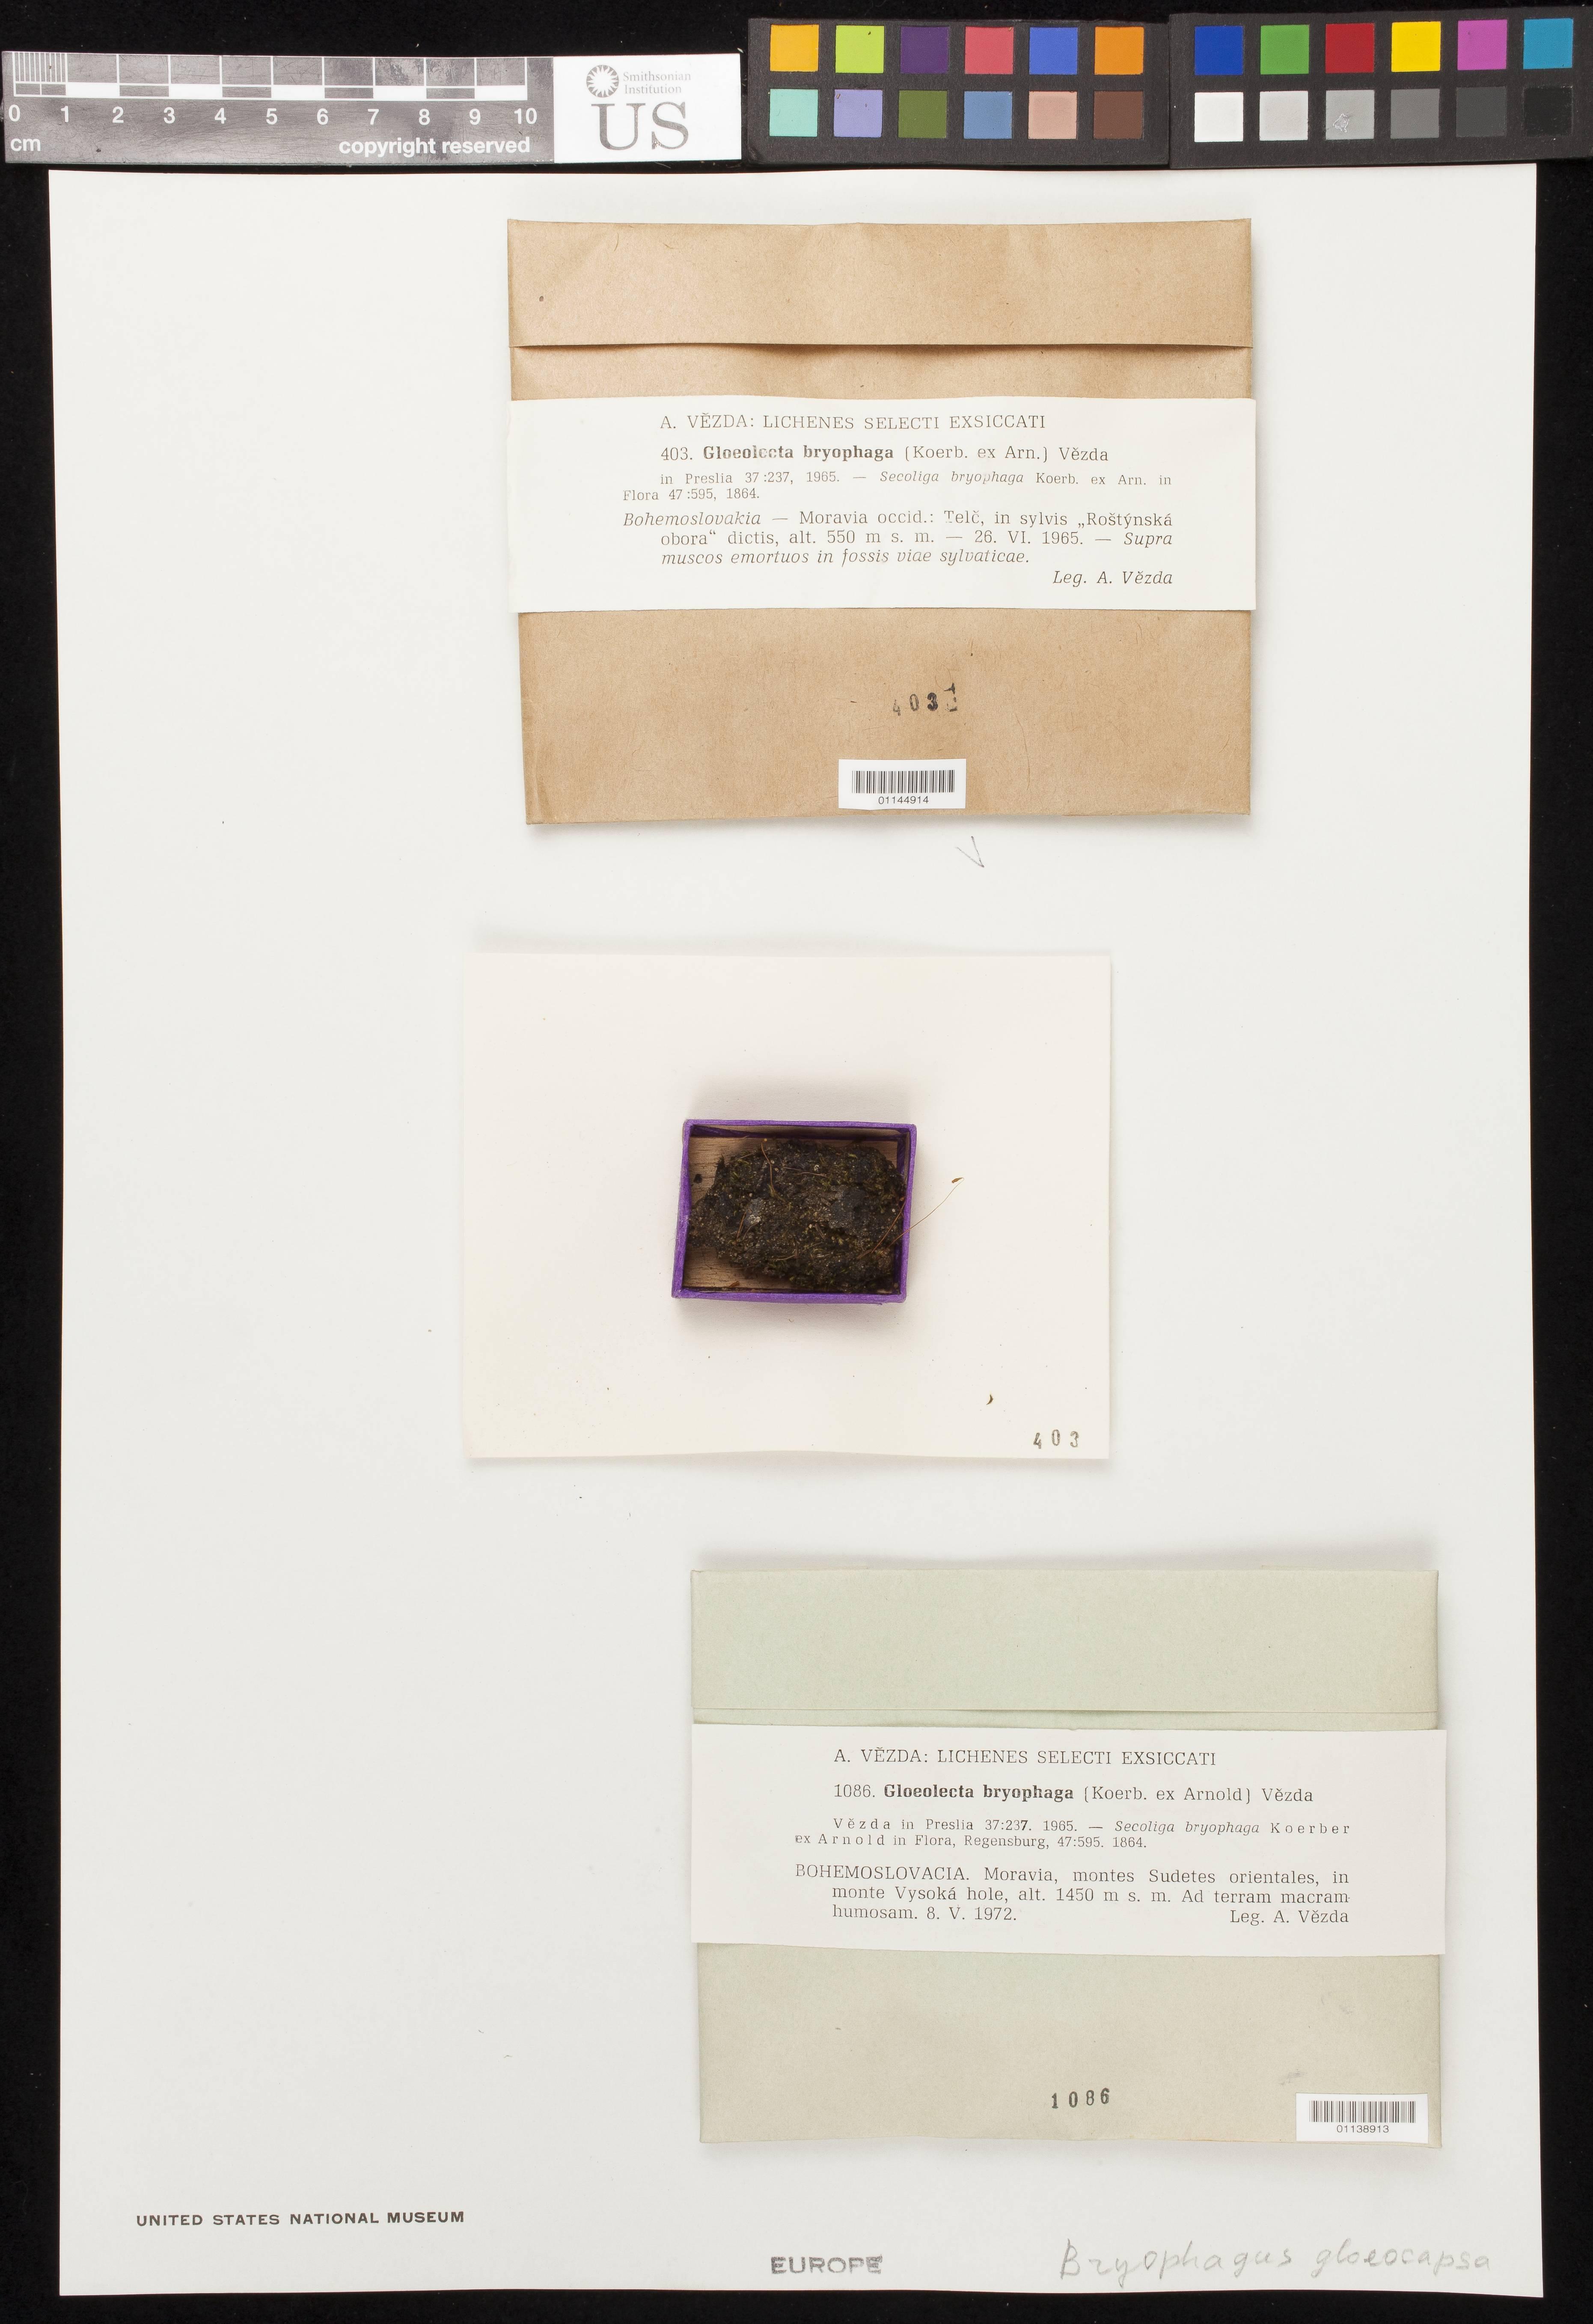 Image of <i>Bryophagus gloeocapsa</i> (Nitschke ex Arnold) Baloch, Gilenstam & Wedin